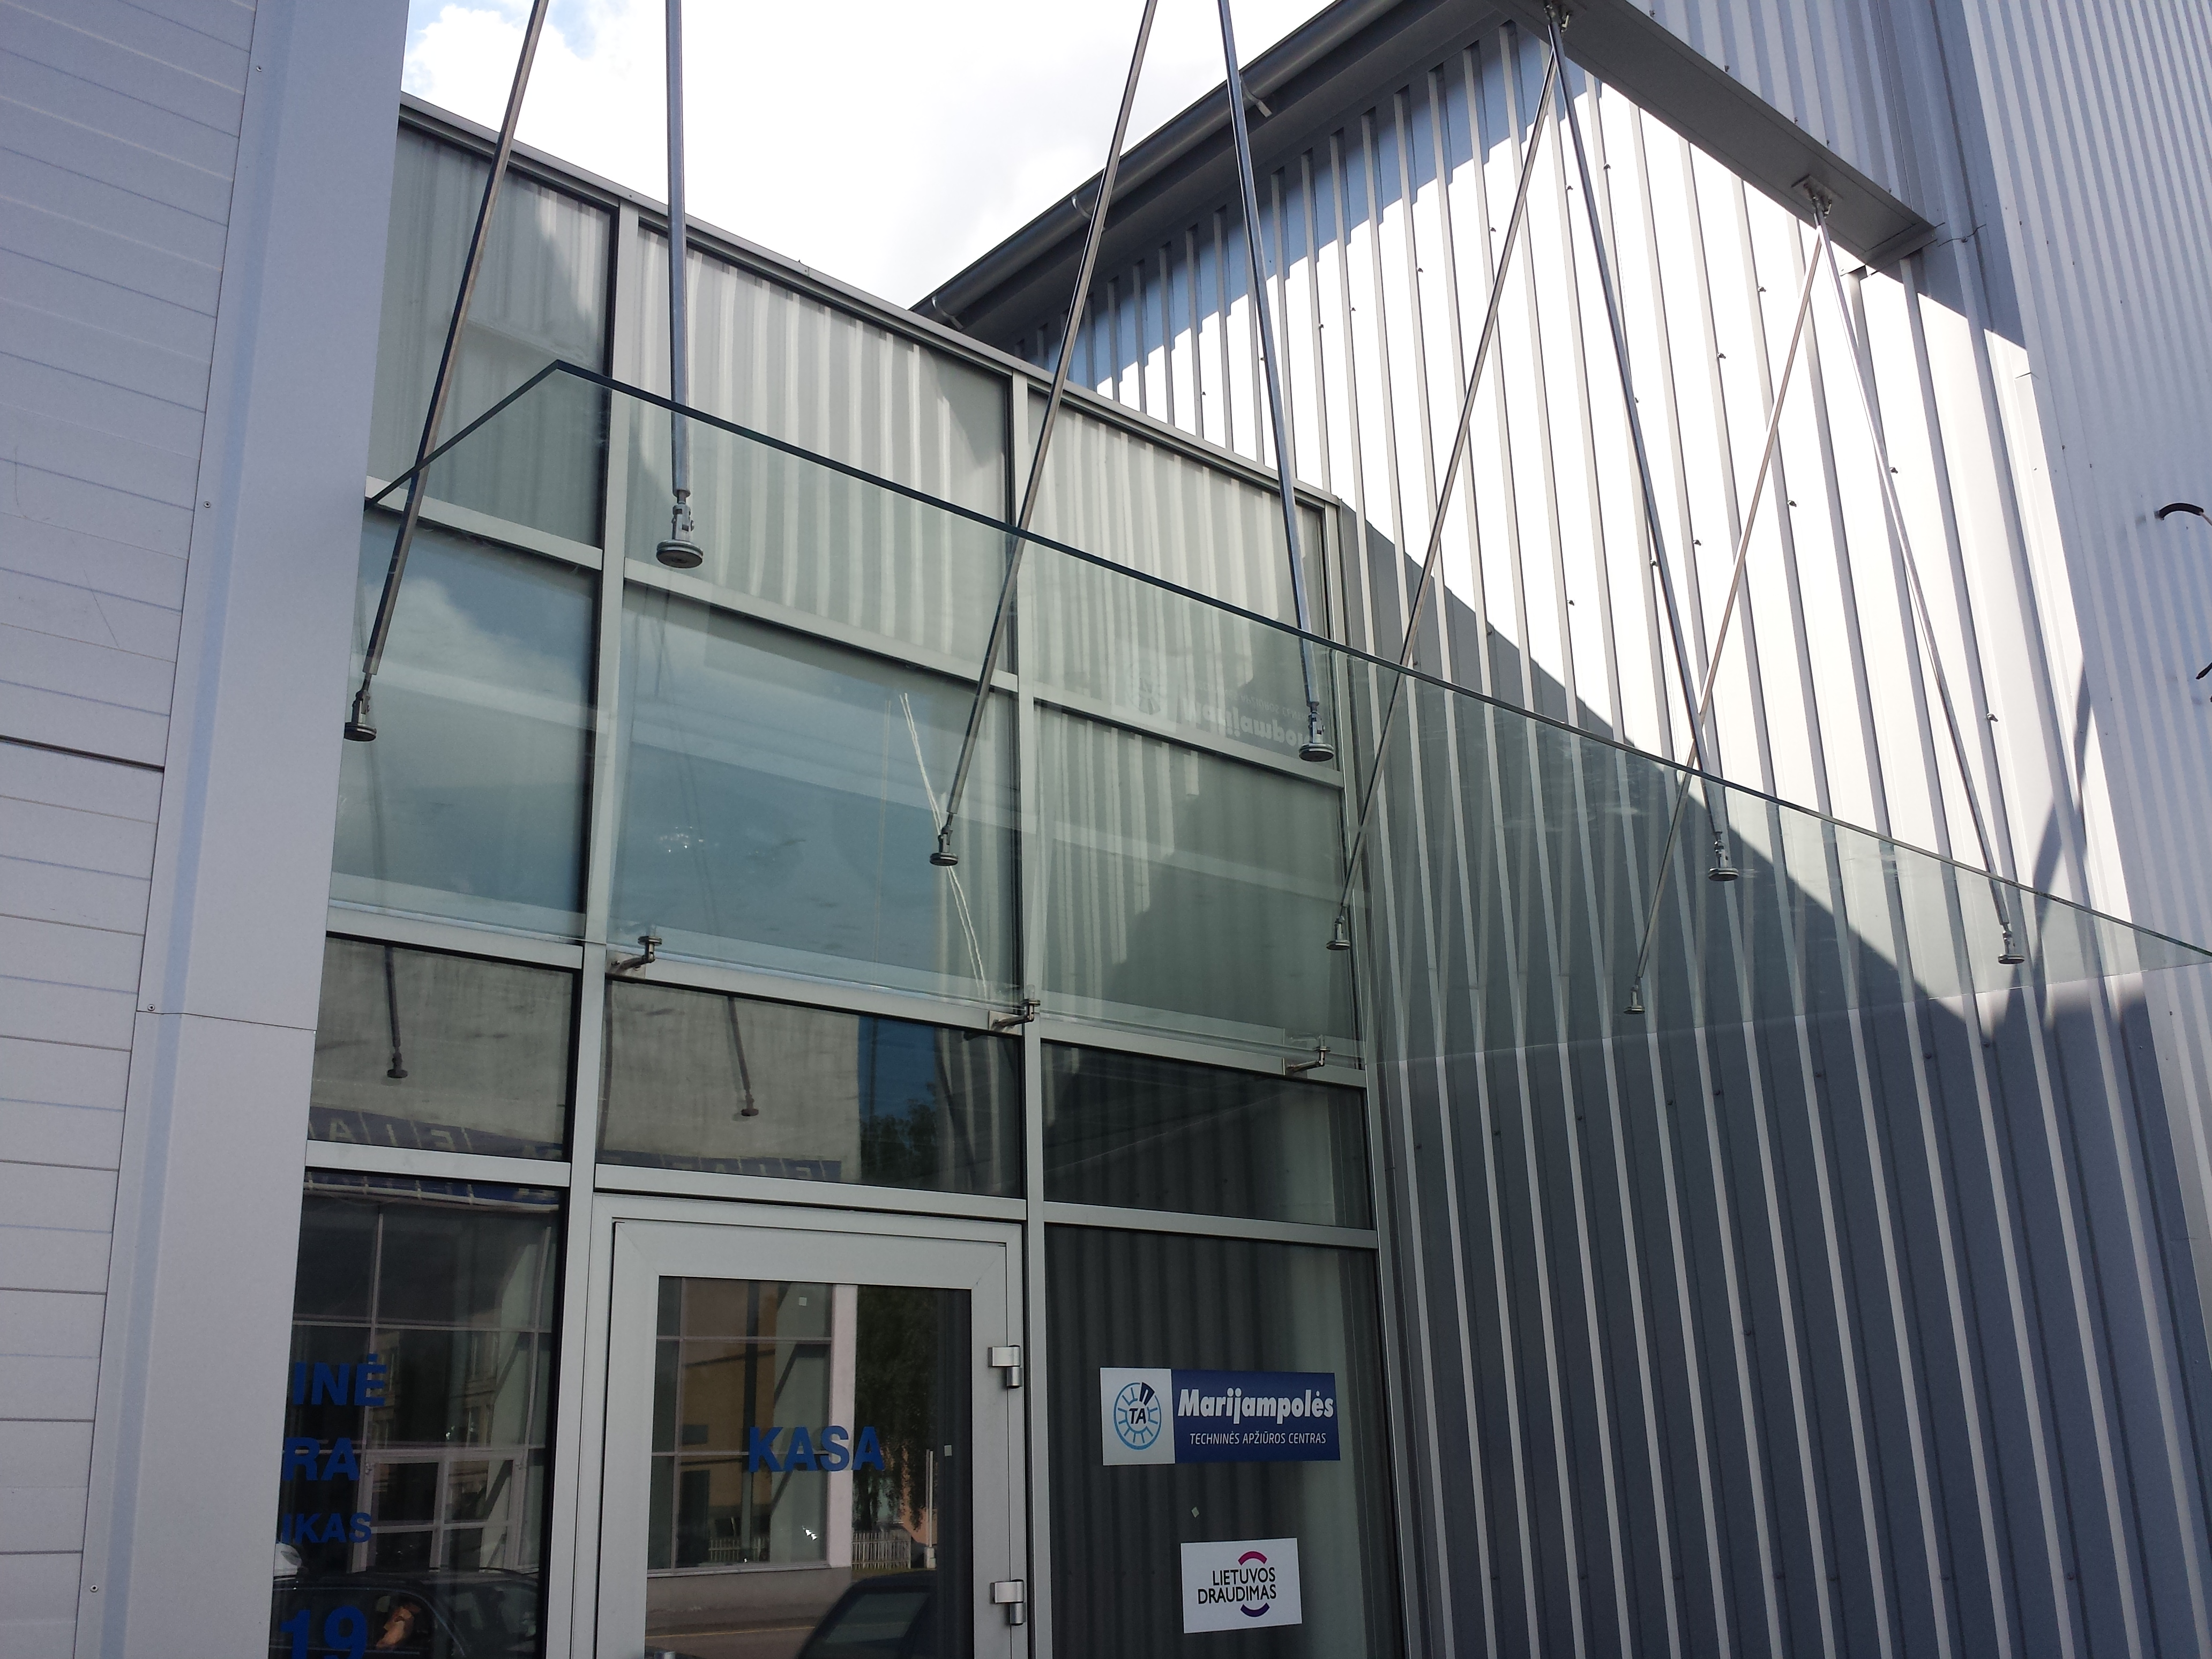 stiklinis-stogelis-stiklopasaulis-lt